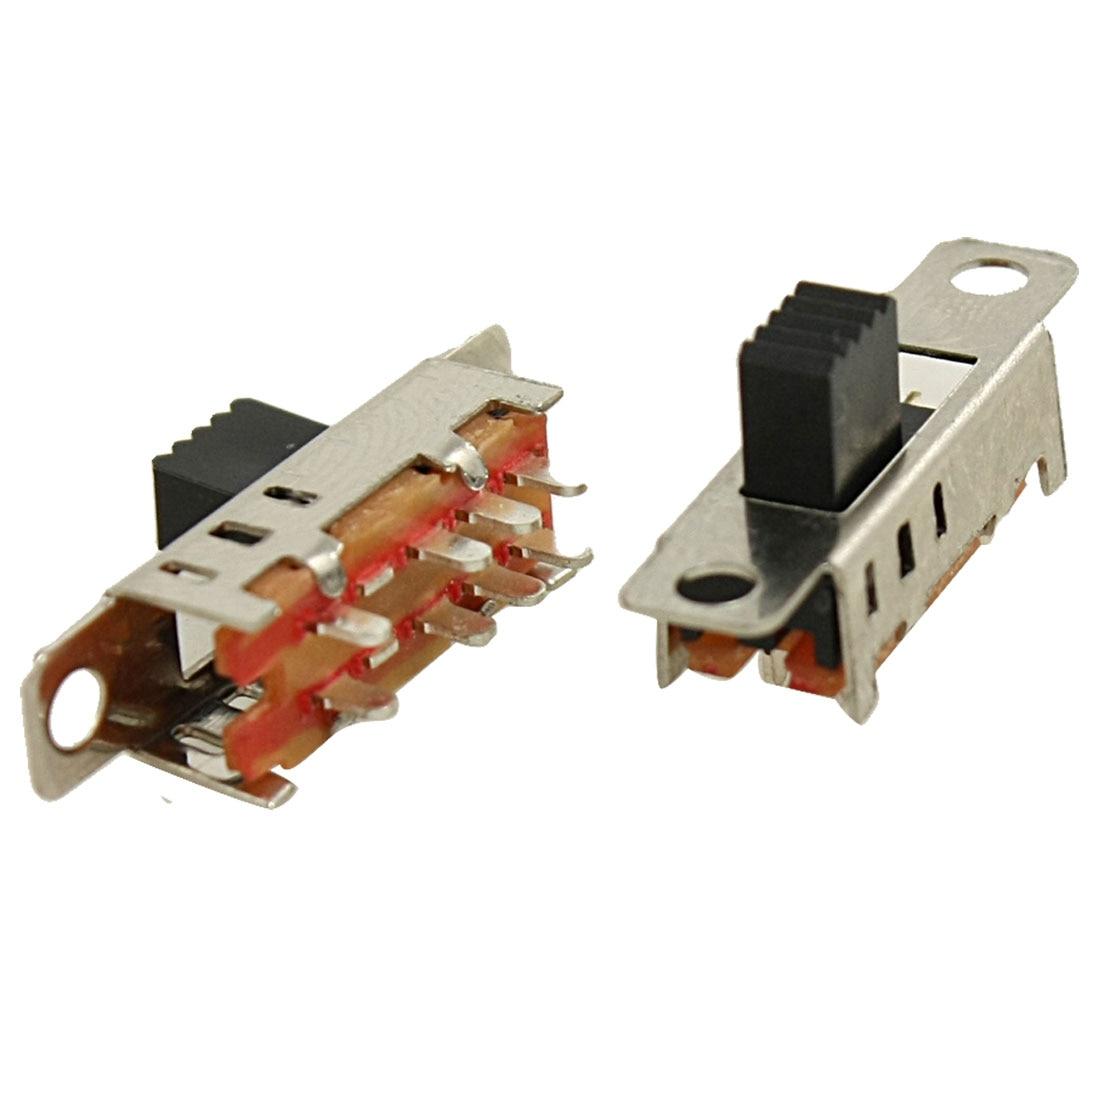 UXCELL 5 Pcs 8 Pin Pcb 3 Position On/On/On Dp3t 2P3t Panel Mini Slide Switch Ss23e04-G5 uxcell 10 pcs single unit pushwheel thumbwheel switch km1 0 9